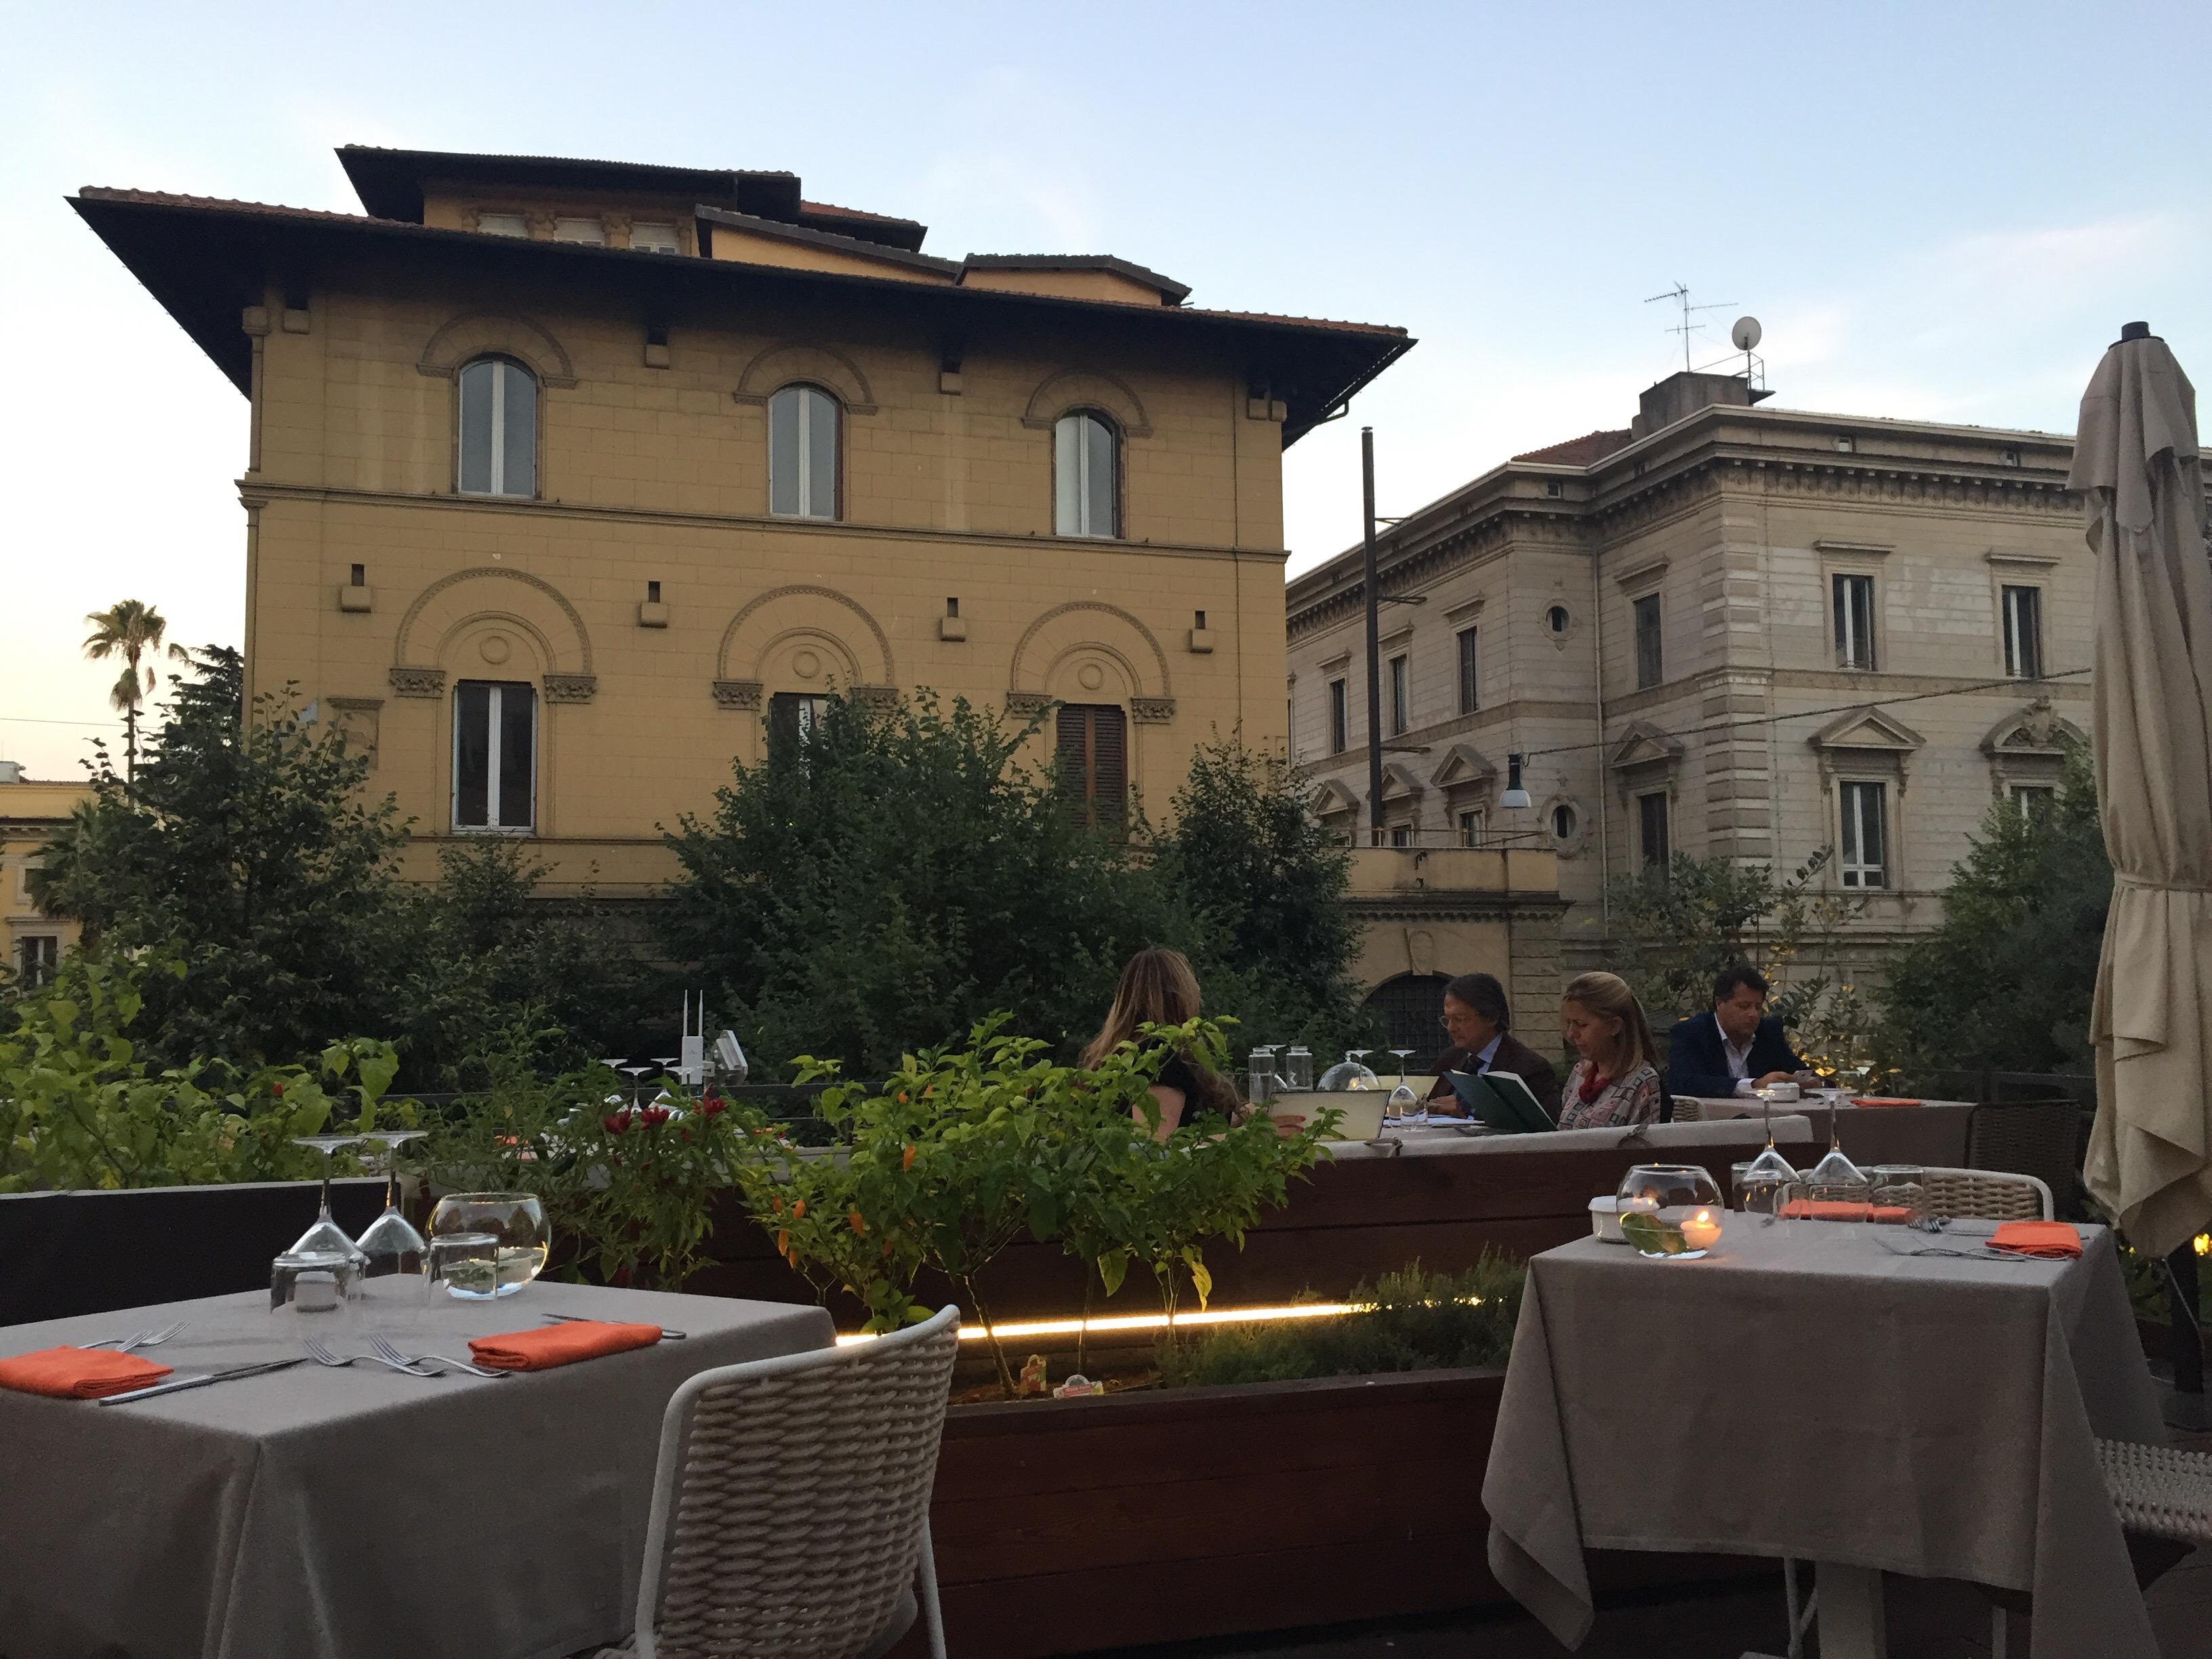 Fiore Cucina Flexiteriana , Terrazza